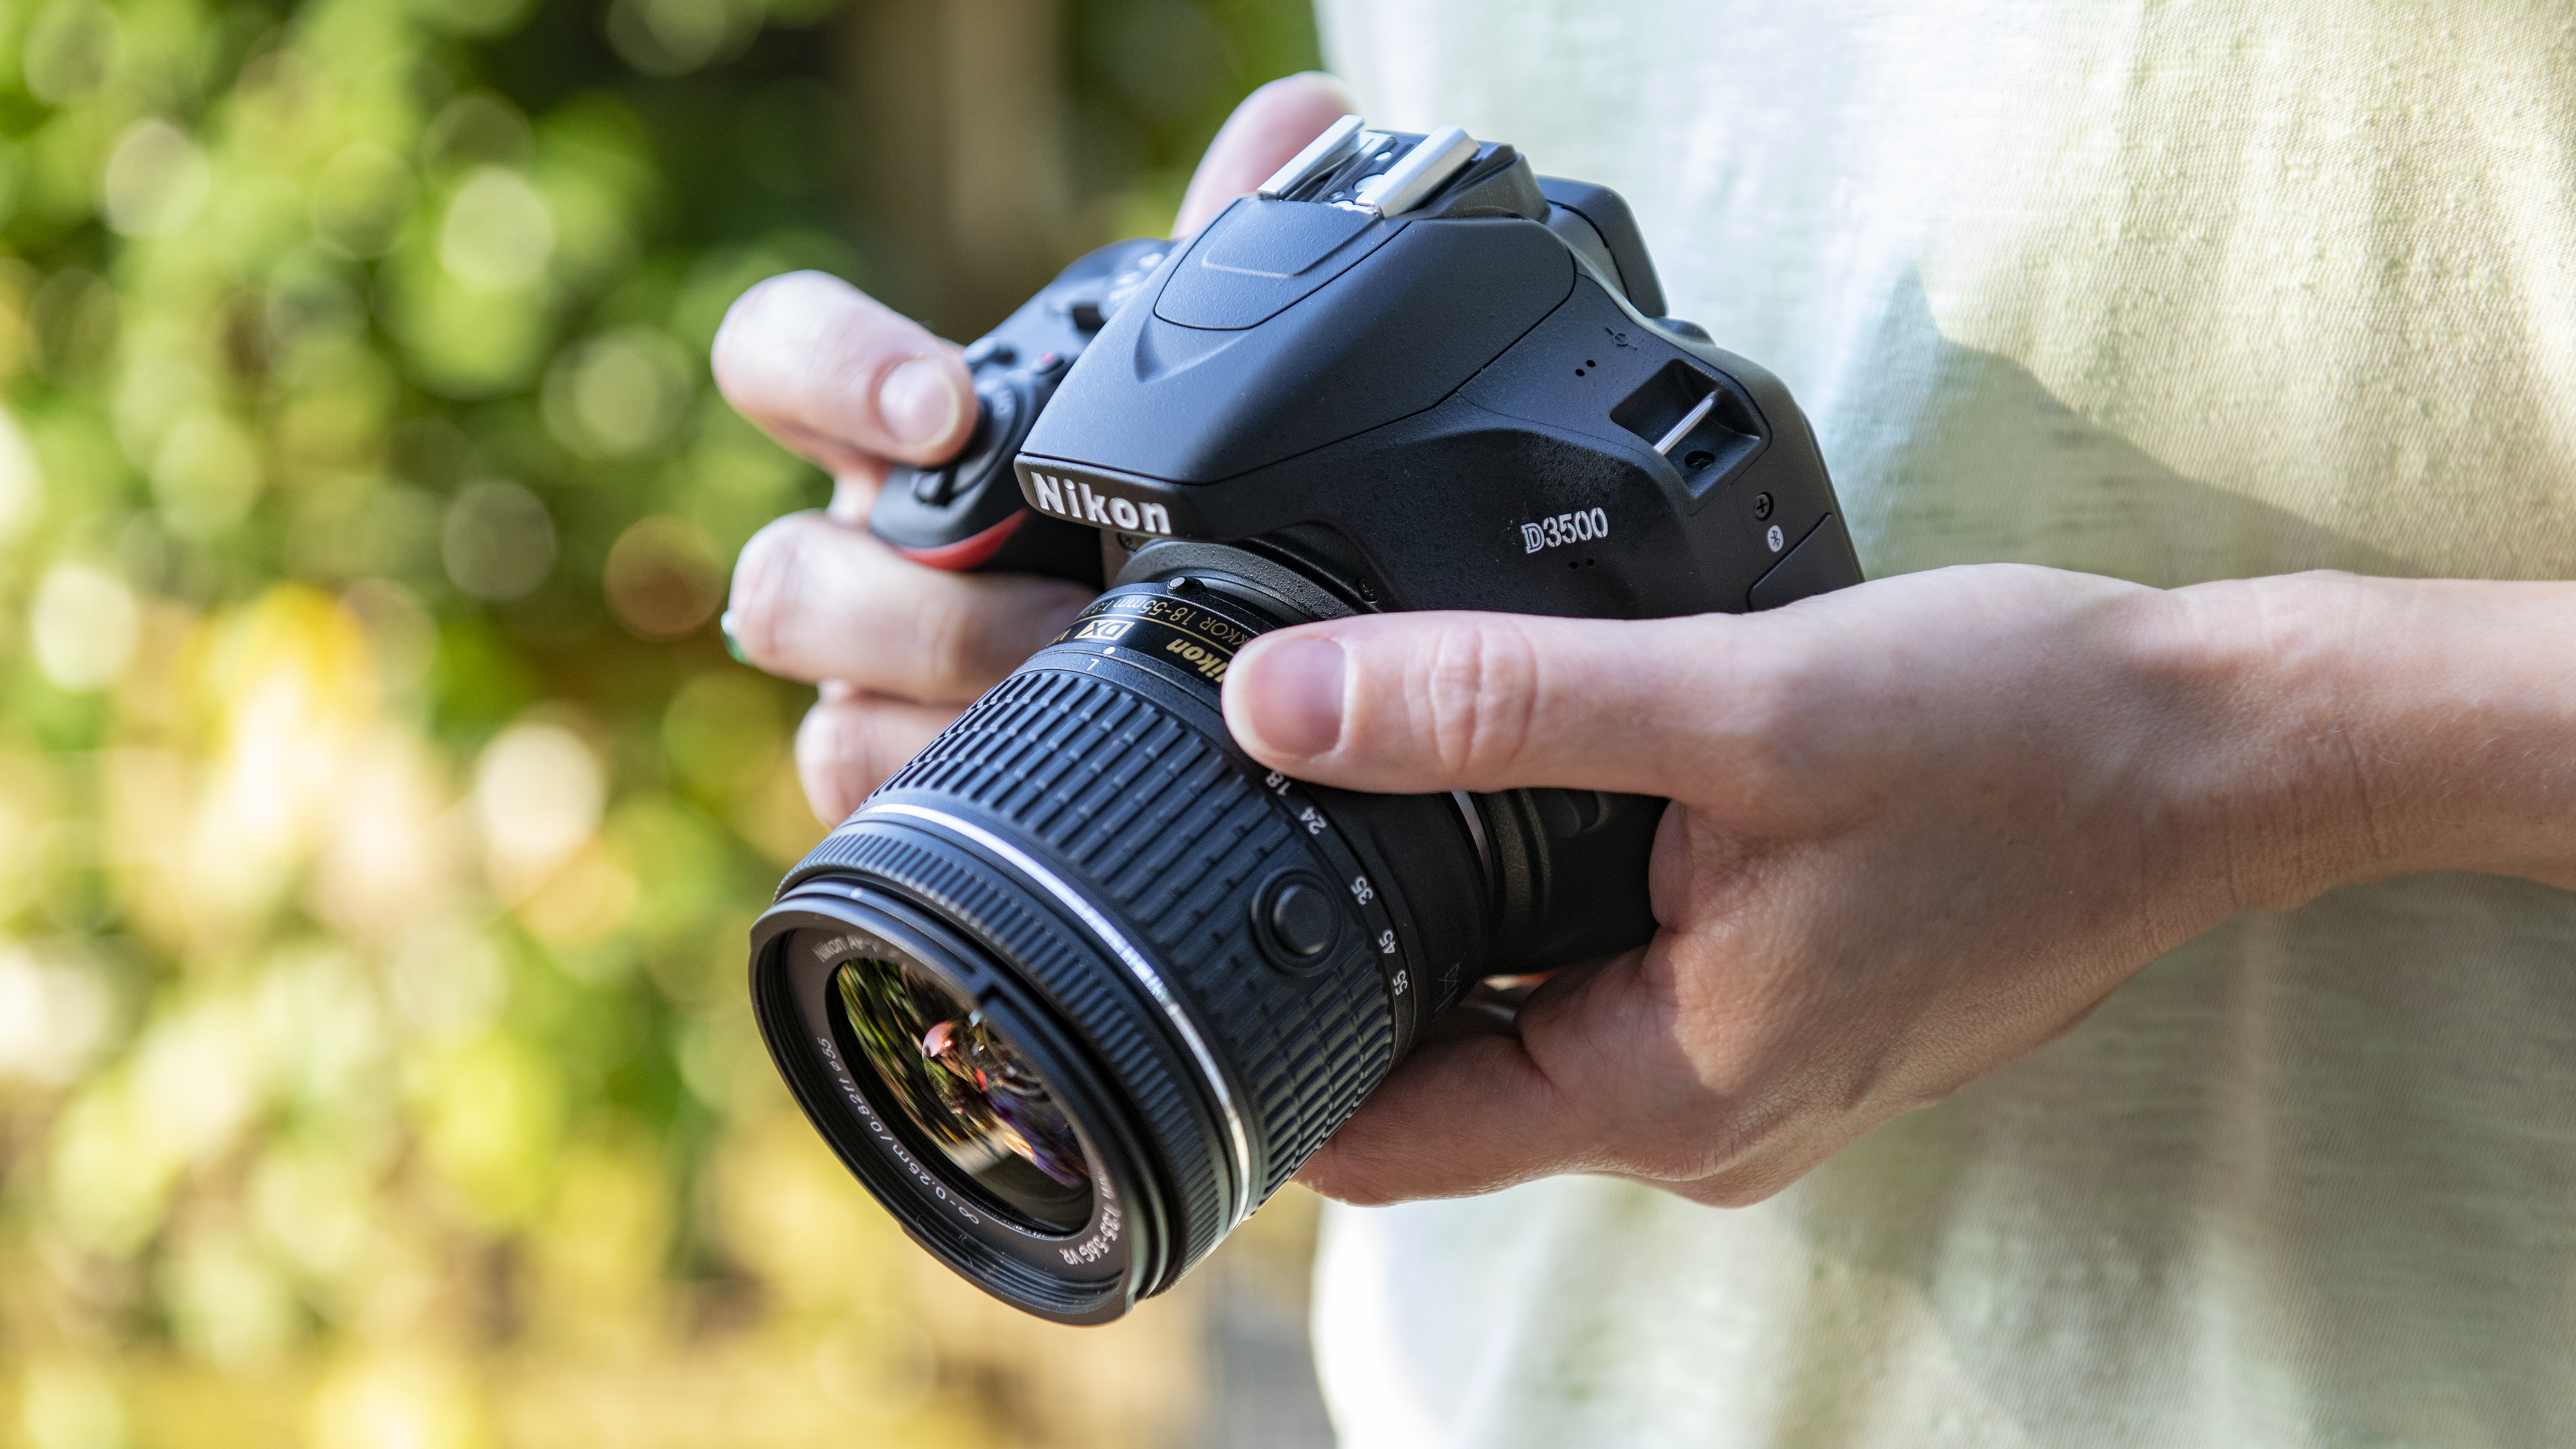 Best camera: Nikon D3500